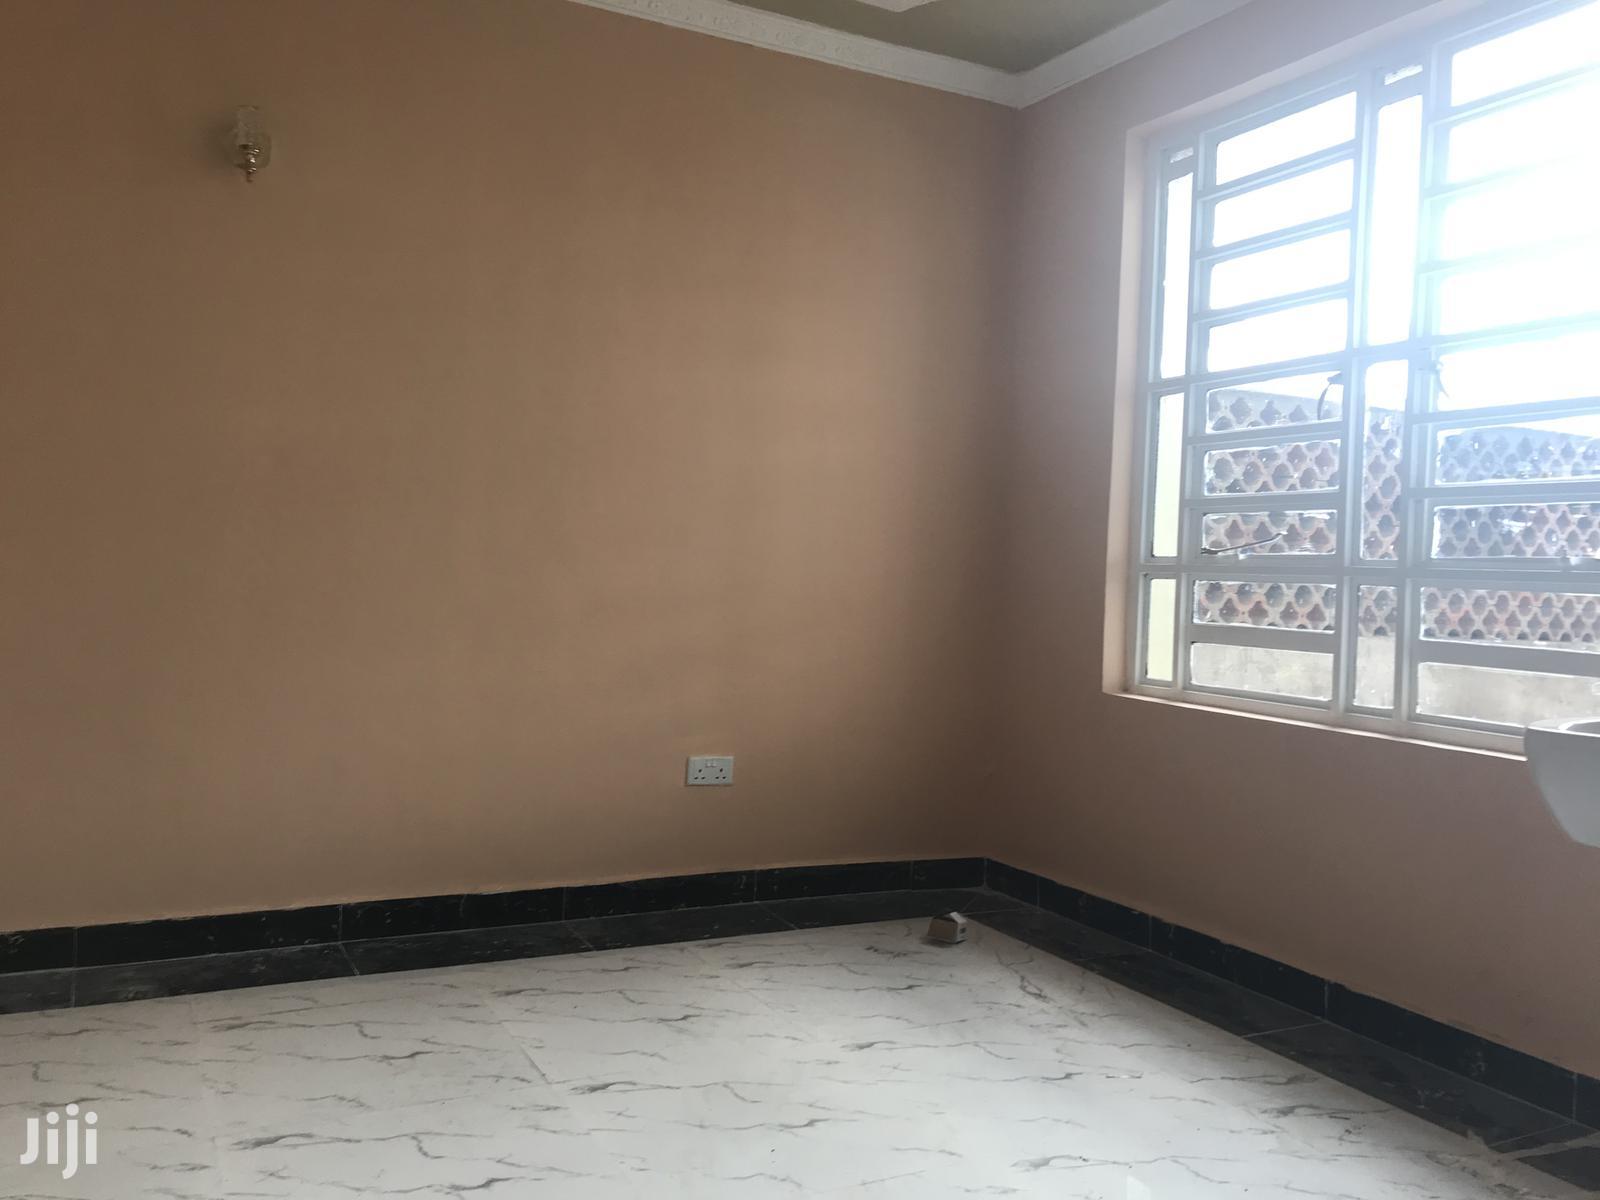 4bedroom House Syokimau   Houses & Apartments For Rent for sale in Syokimau, Machakos, Kenya